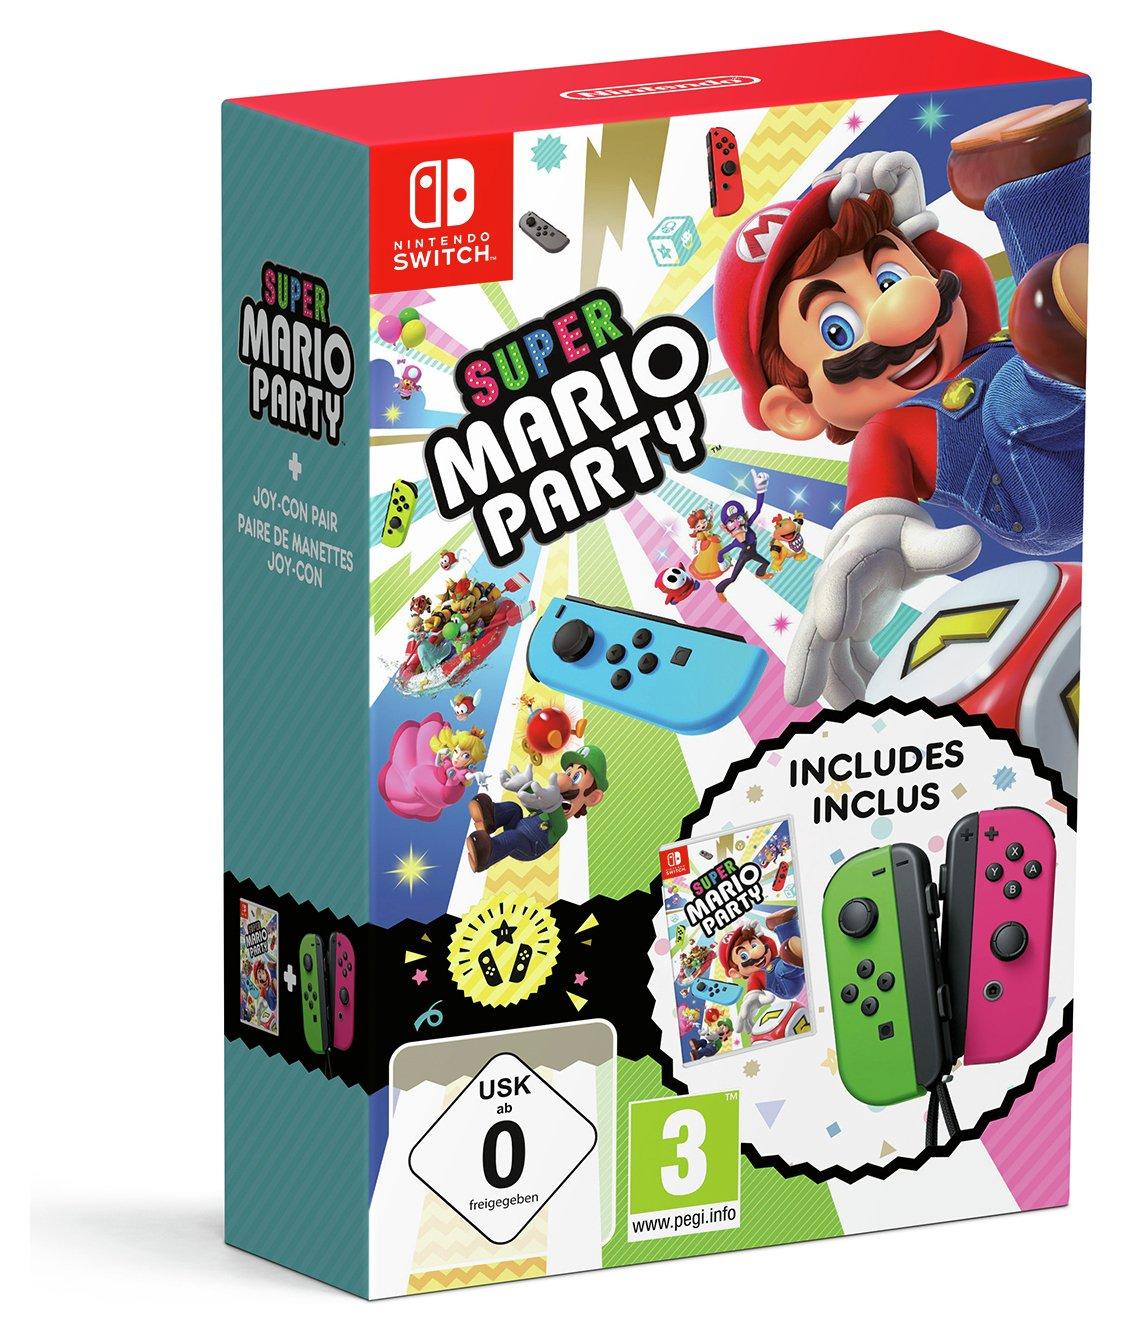 Super Mario Party Nintendo Switch Game & Joy-Con Pre-Order